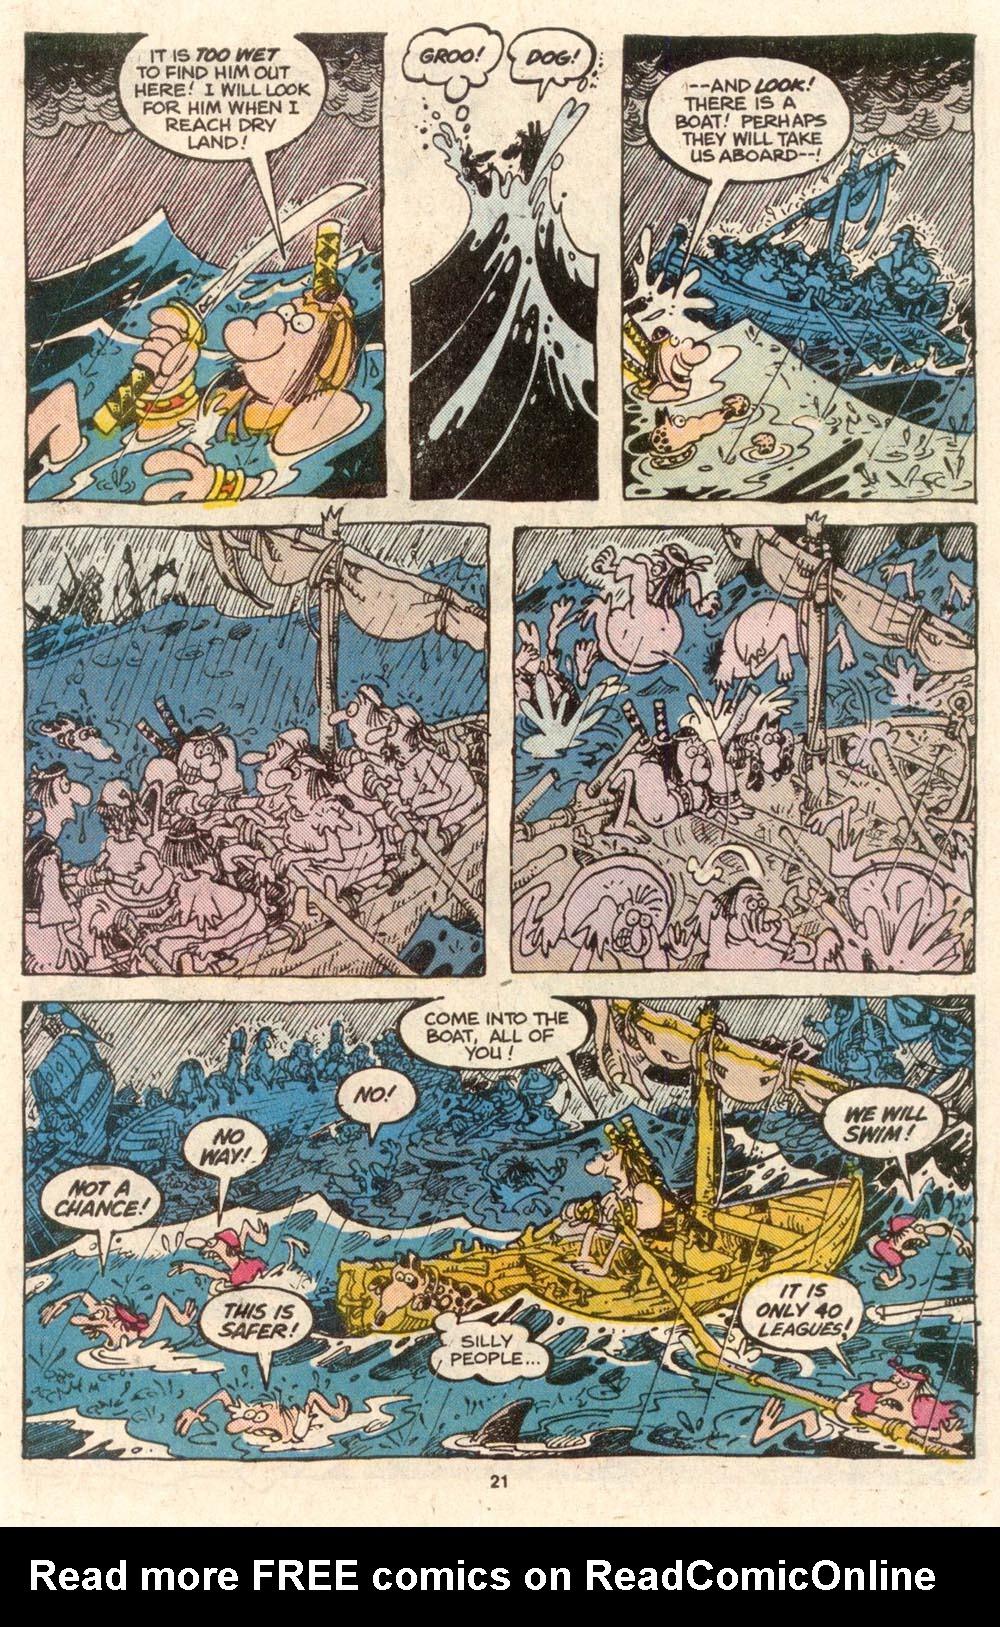 Read online Sergio Aragonés Groo the Wanderer comic -  Issue #54 - 22